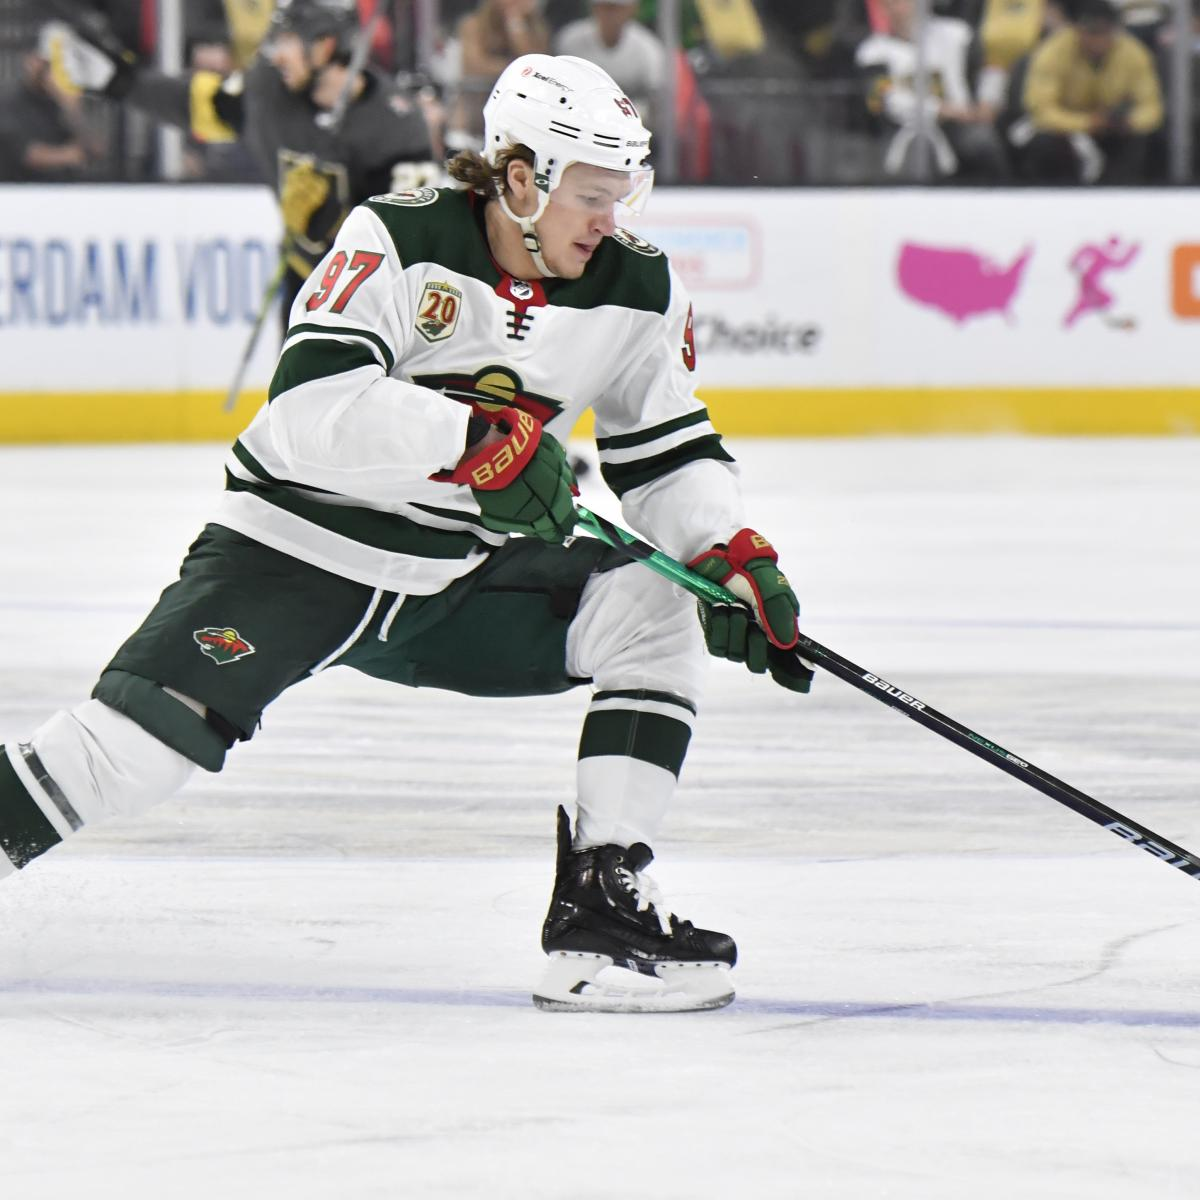 NHL Free Agents 2021: Kirill Kaprizov, Brady Tkachuk Rumors and Predictions